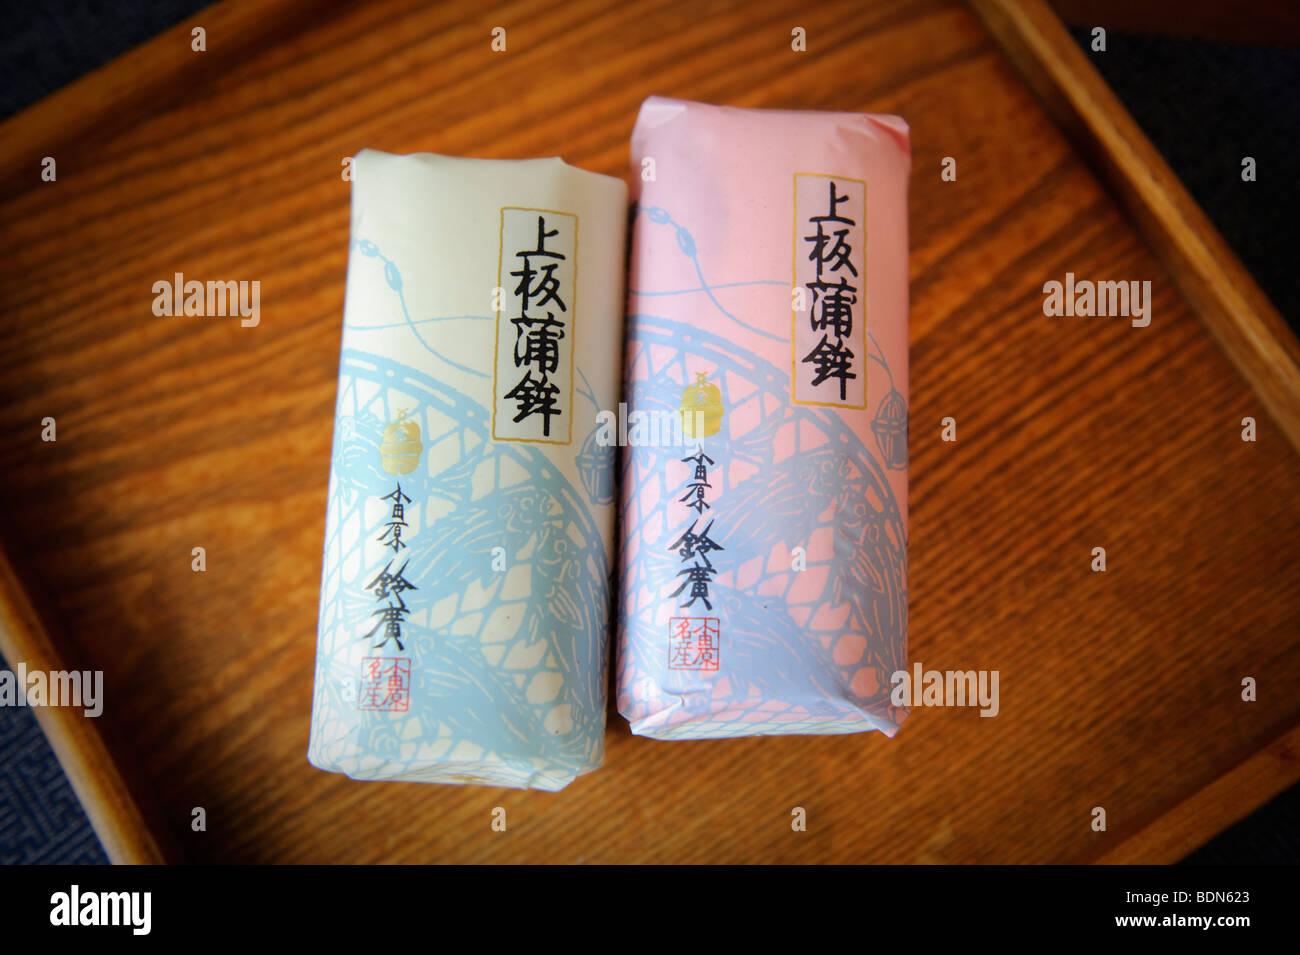 Kamaboko for sale, Suzuhiro kamaboko, Odawara, Kanagawa prefecture, Japan, August 19, 2009. - Stock Image